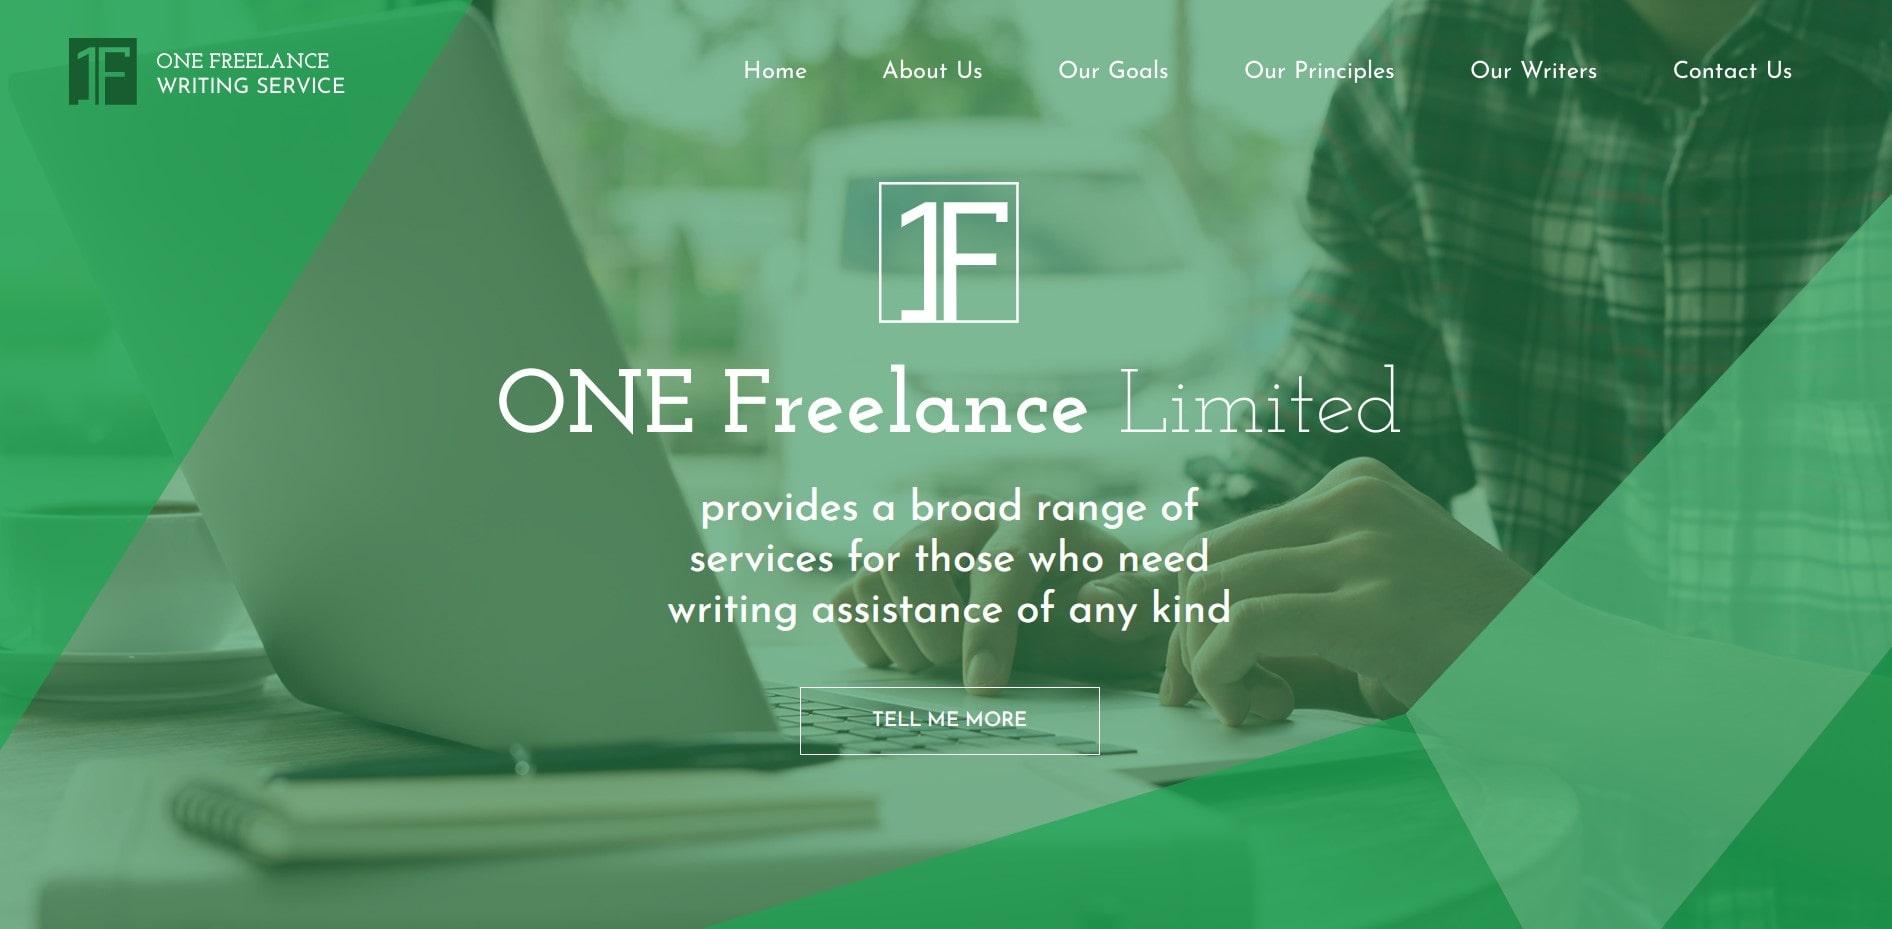 One Freelance